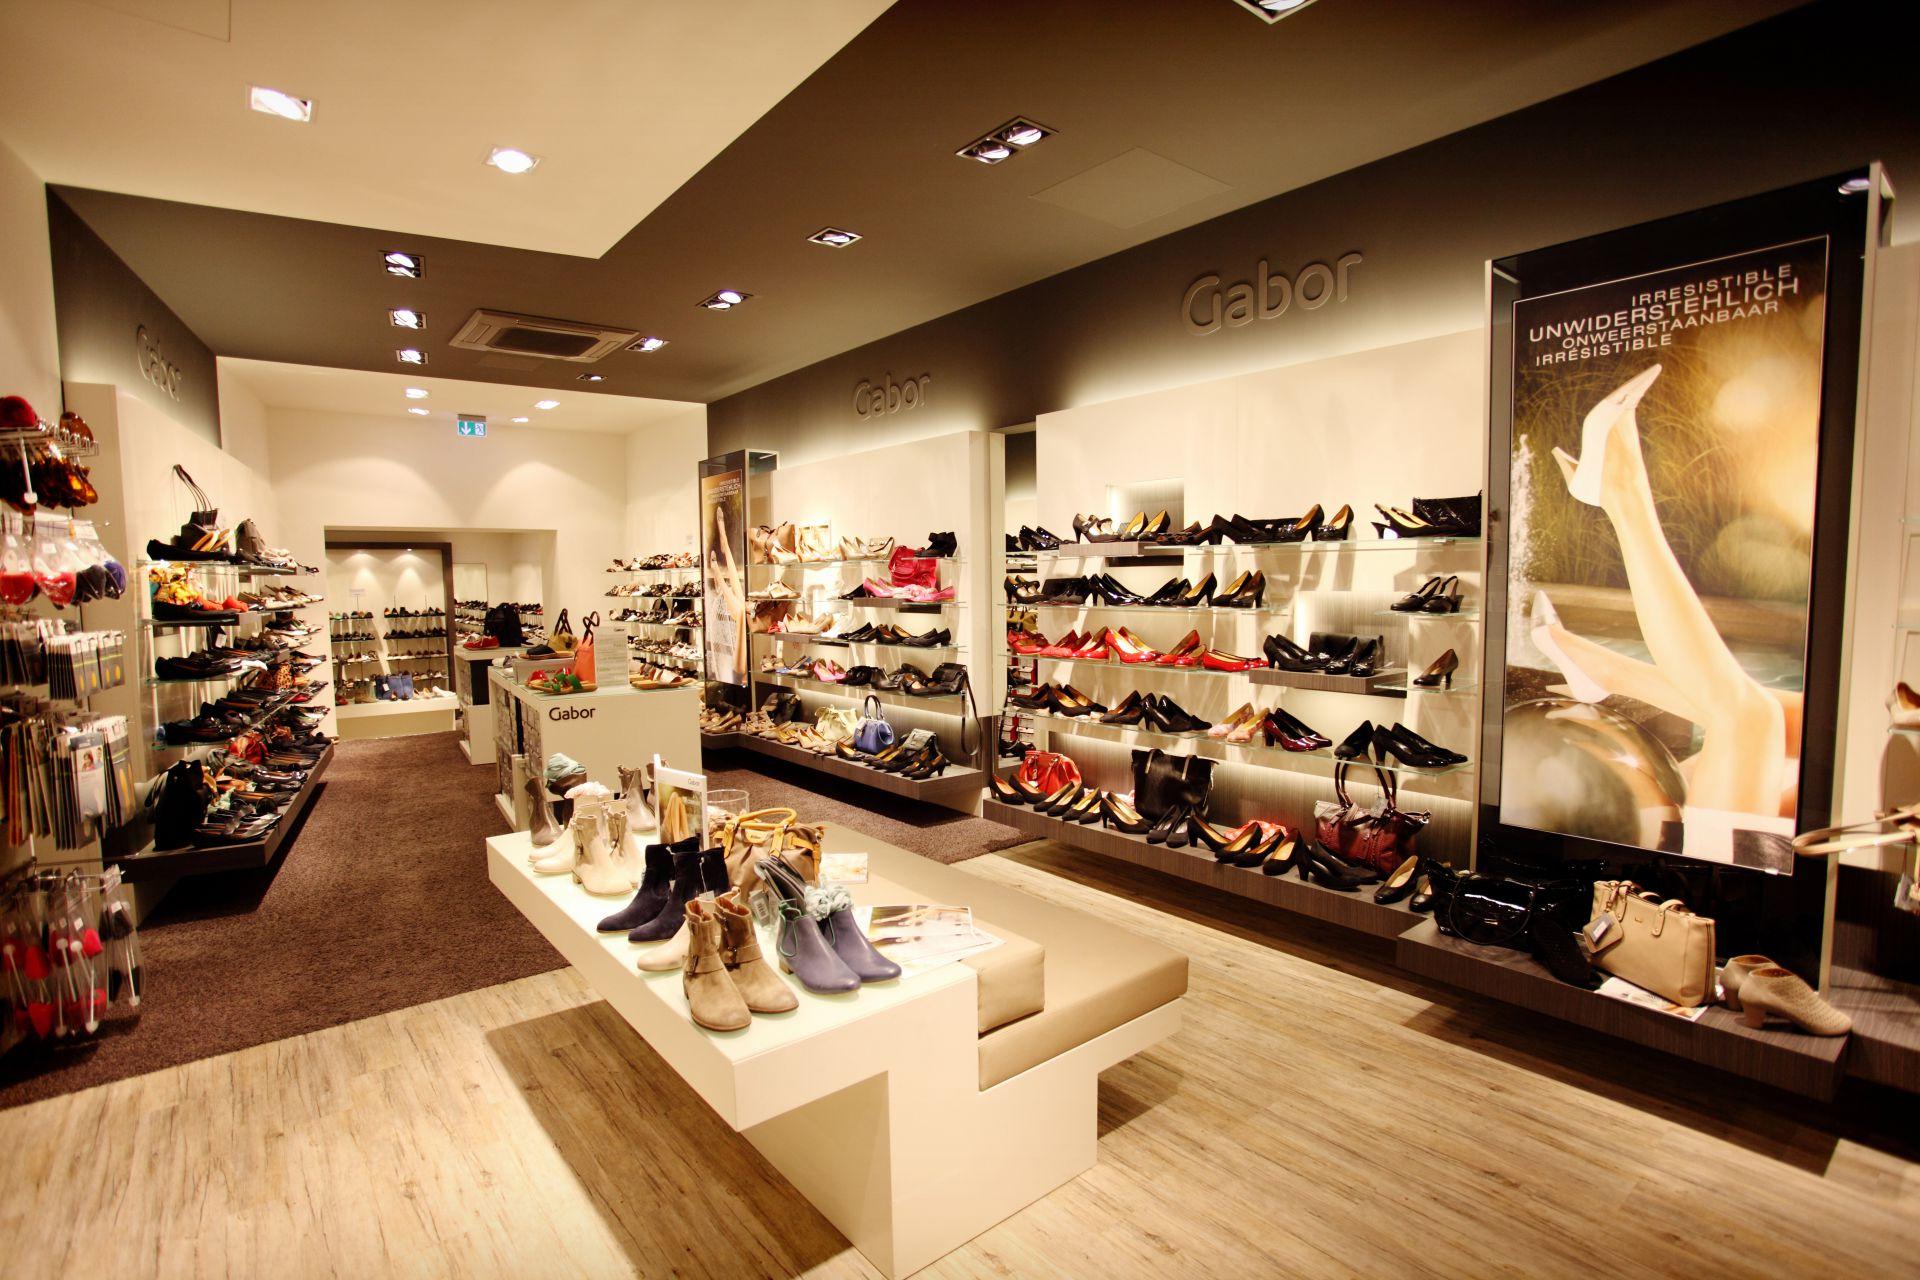 Verkaufsraum Gabor Shop Bremen City